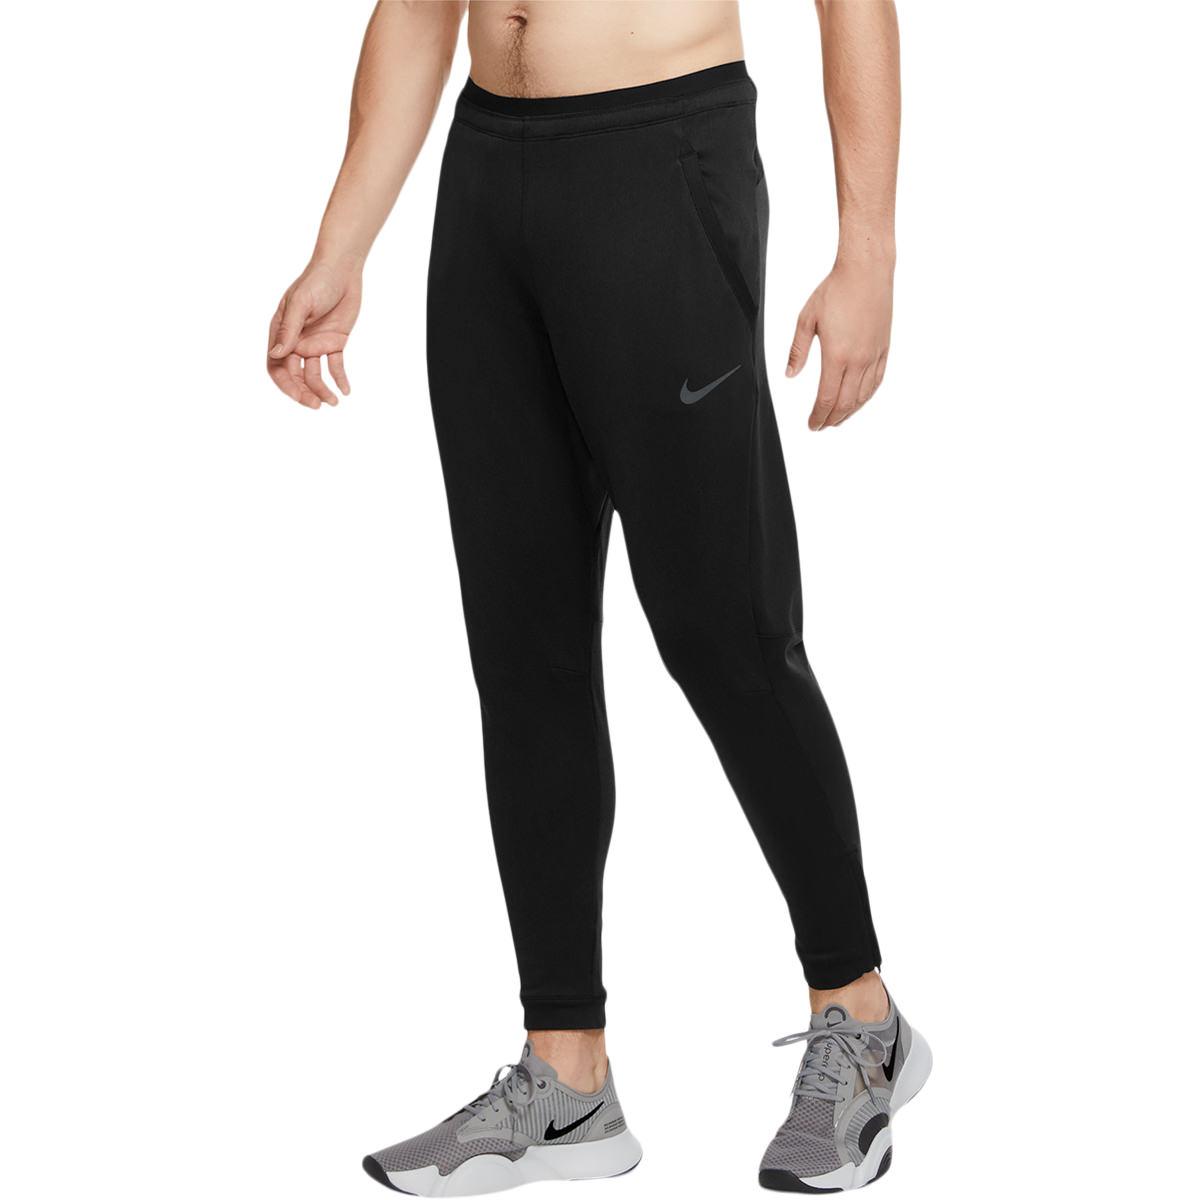 Nike Pro Træningsbukser Herre